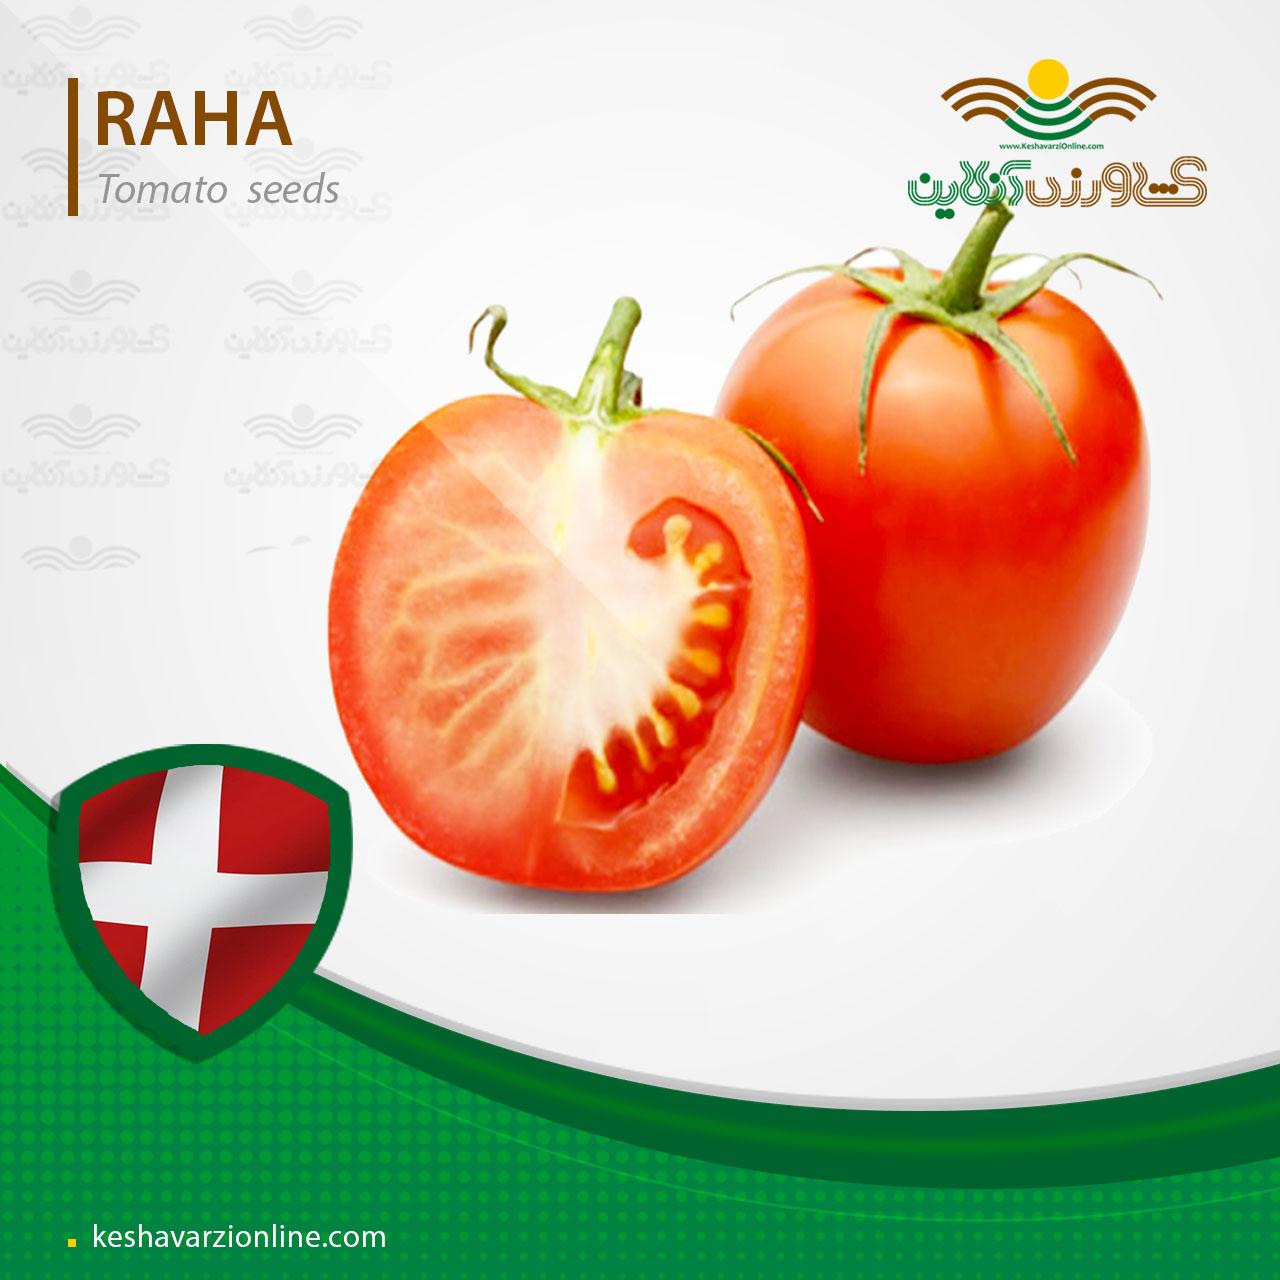 بذر گوجه فرنگی رها